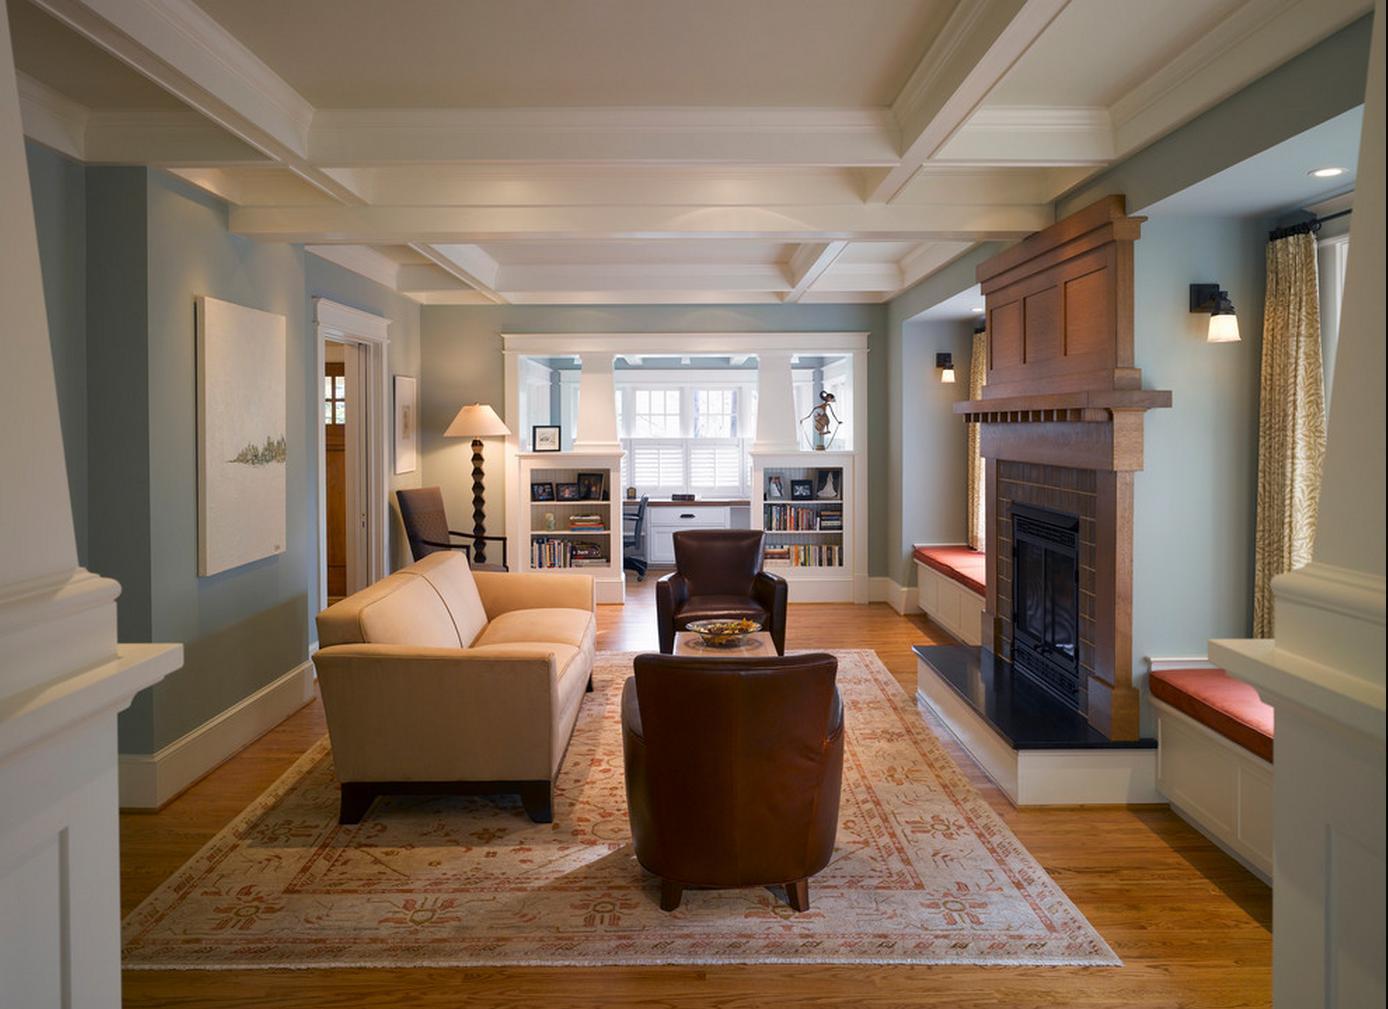 Delorme Designs: CRAFTSMAN STYLE HOME & WYTHE BLUE HC-143